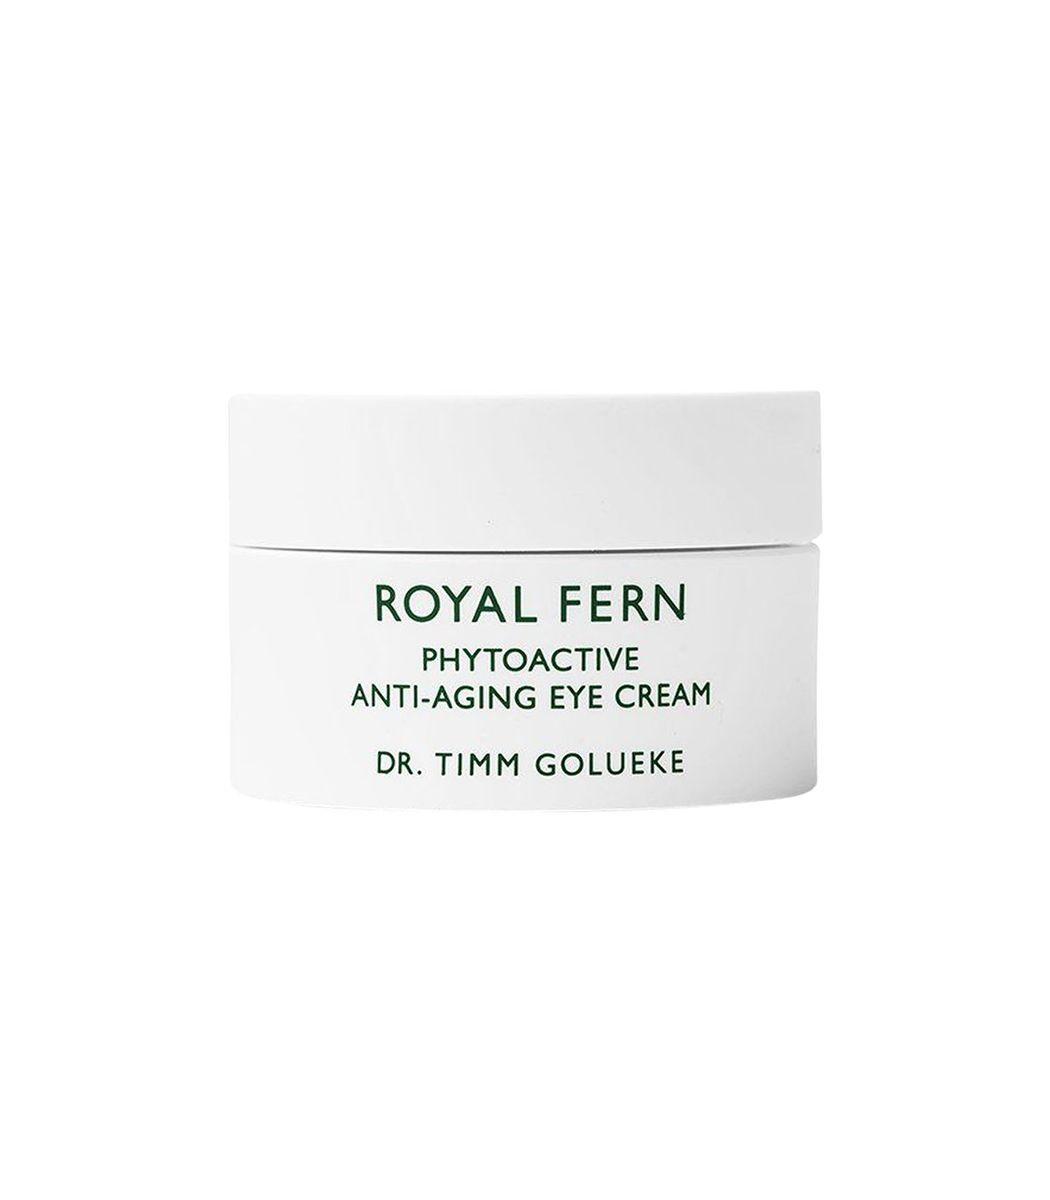 Royal Fern Phytoactive Anti-aging Eye Cream In White